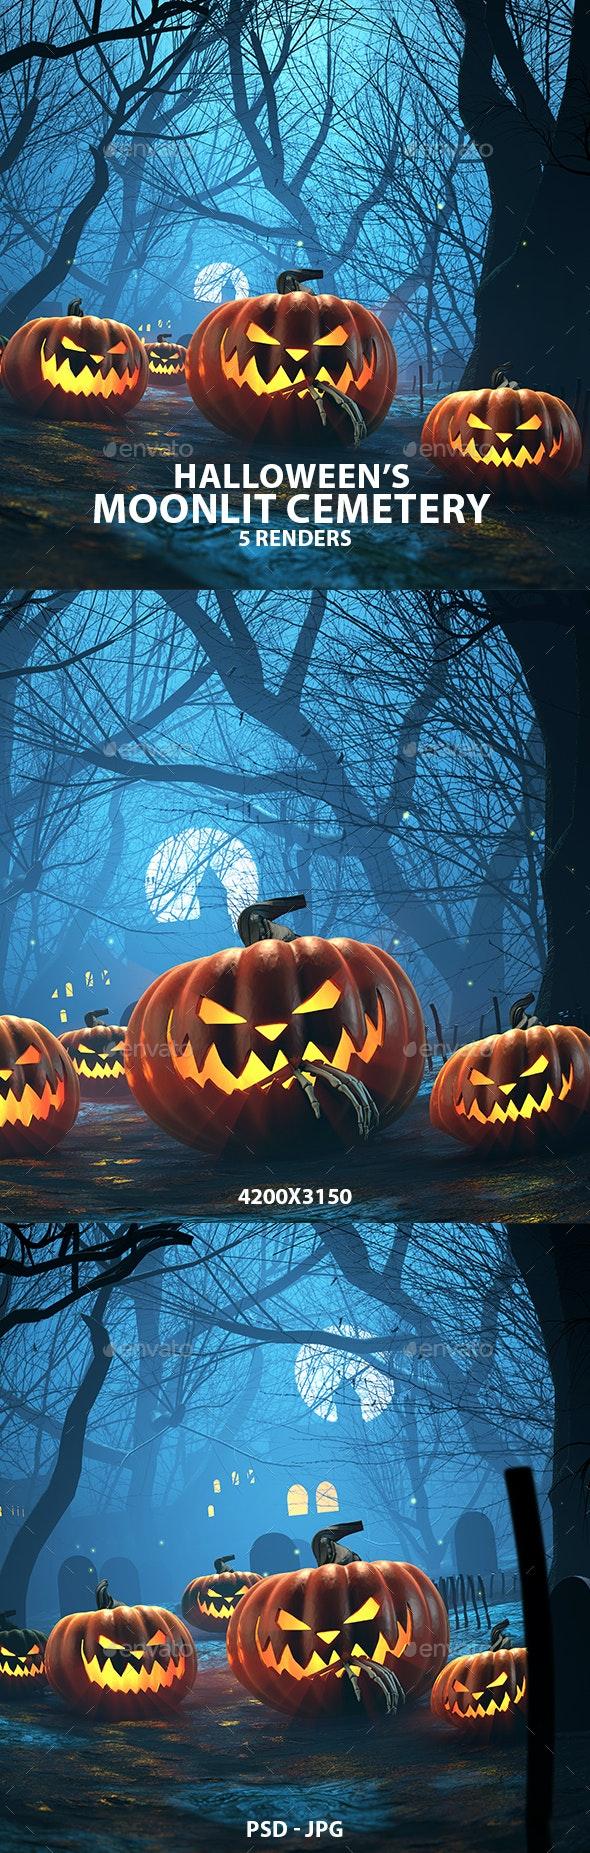 Halloween Moonlit Cemetery 3D Renders - Miscellaneous 3D Renders